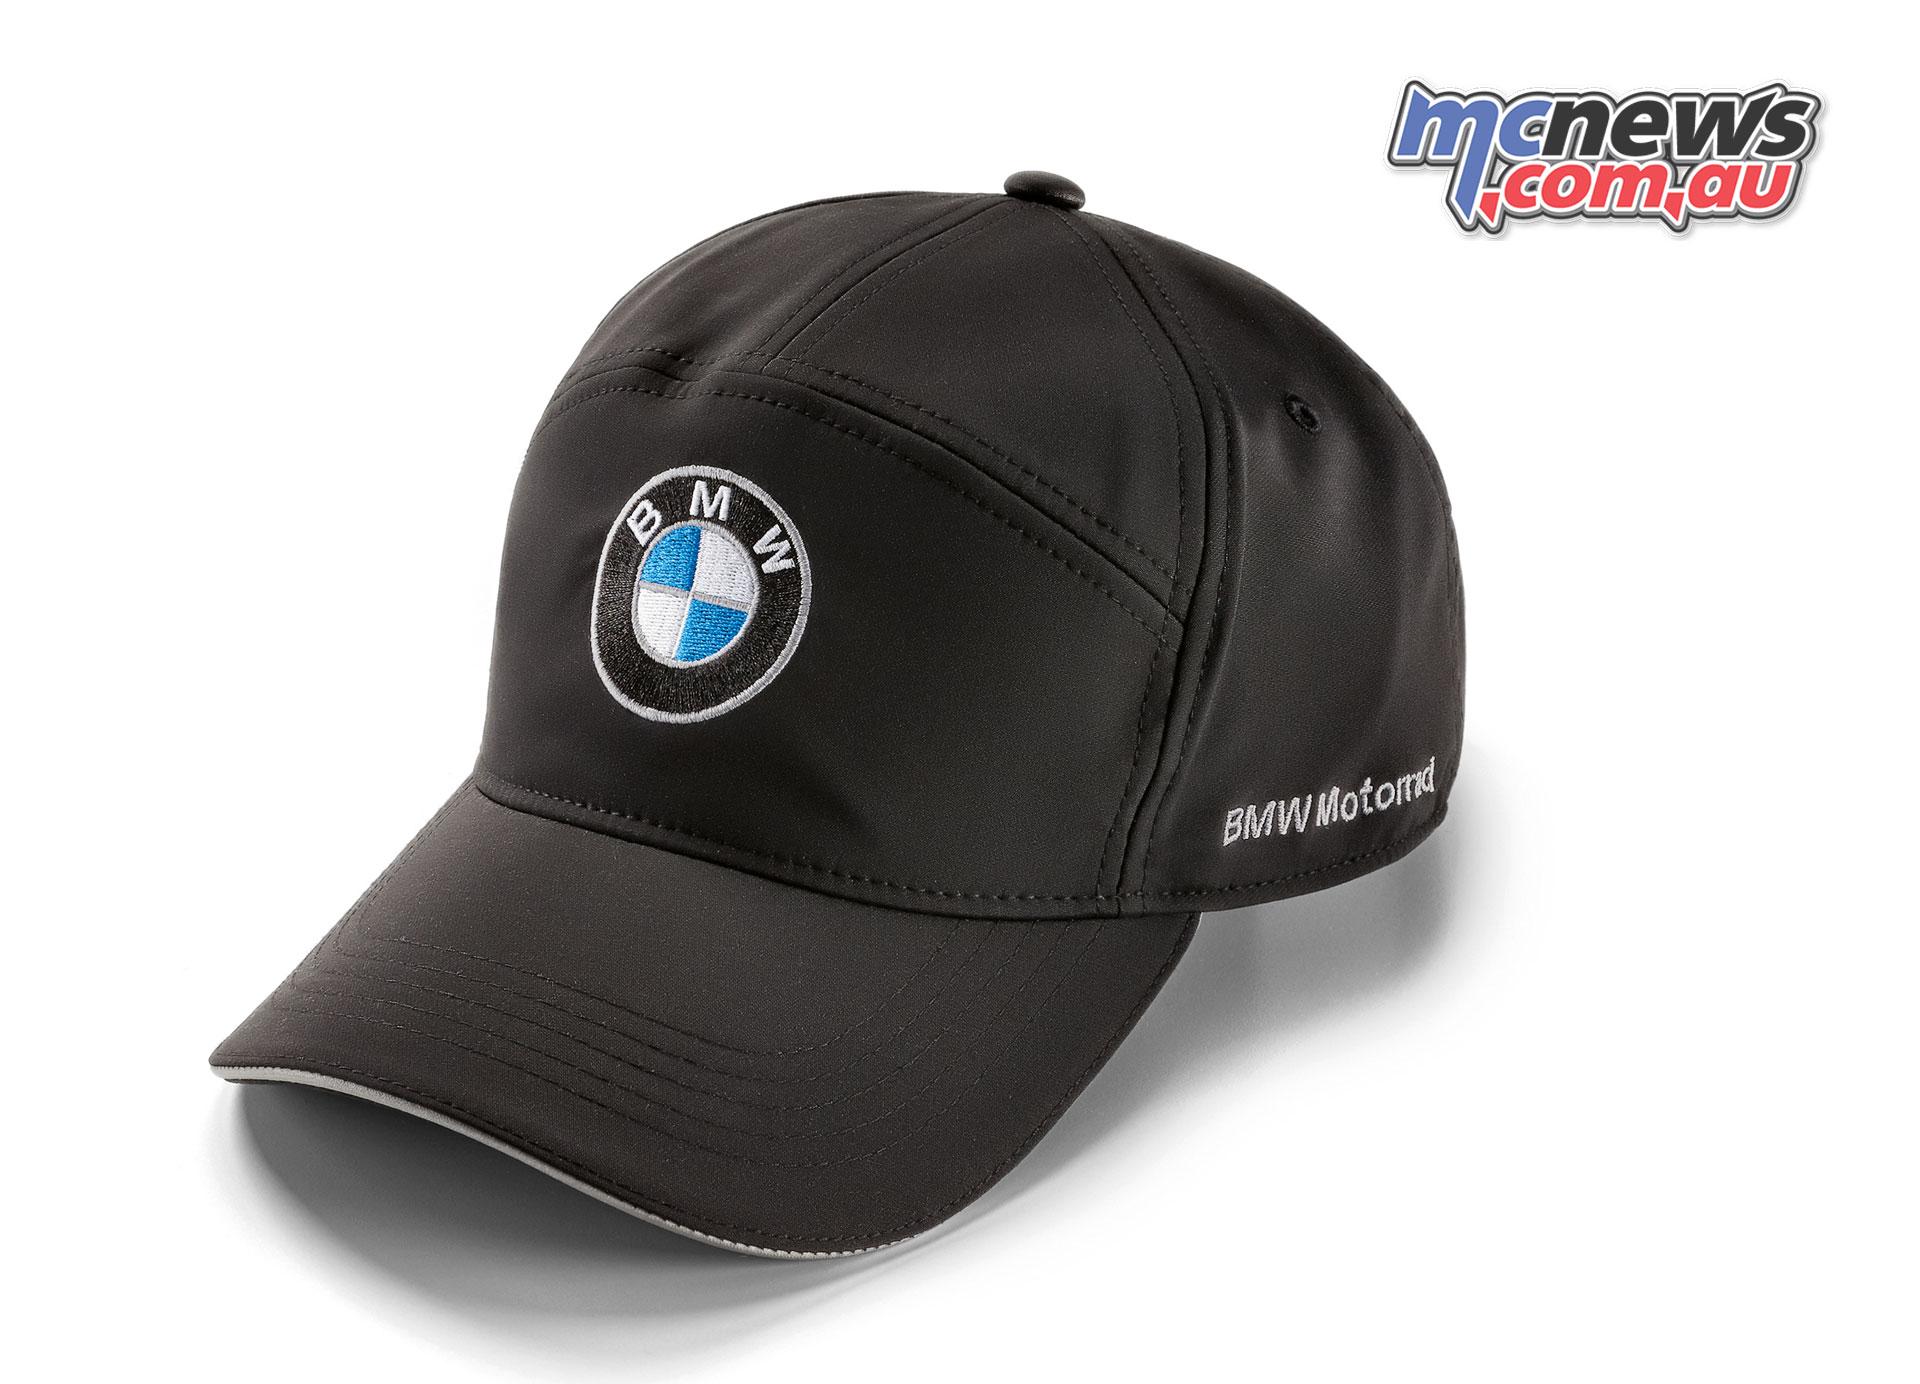 navy shell cap peak team hat motorsport puma sponsor merchandise bmw products